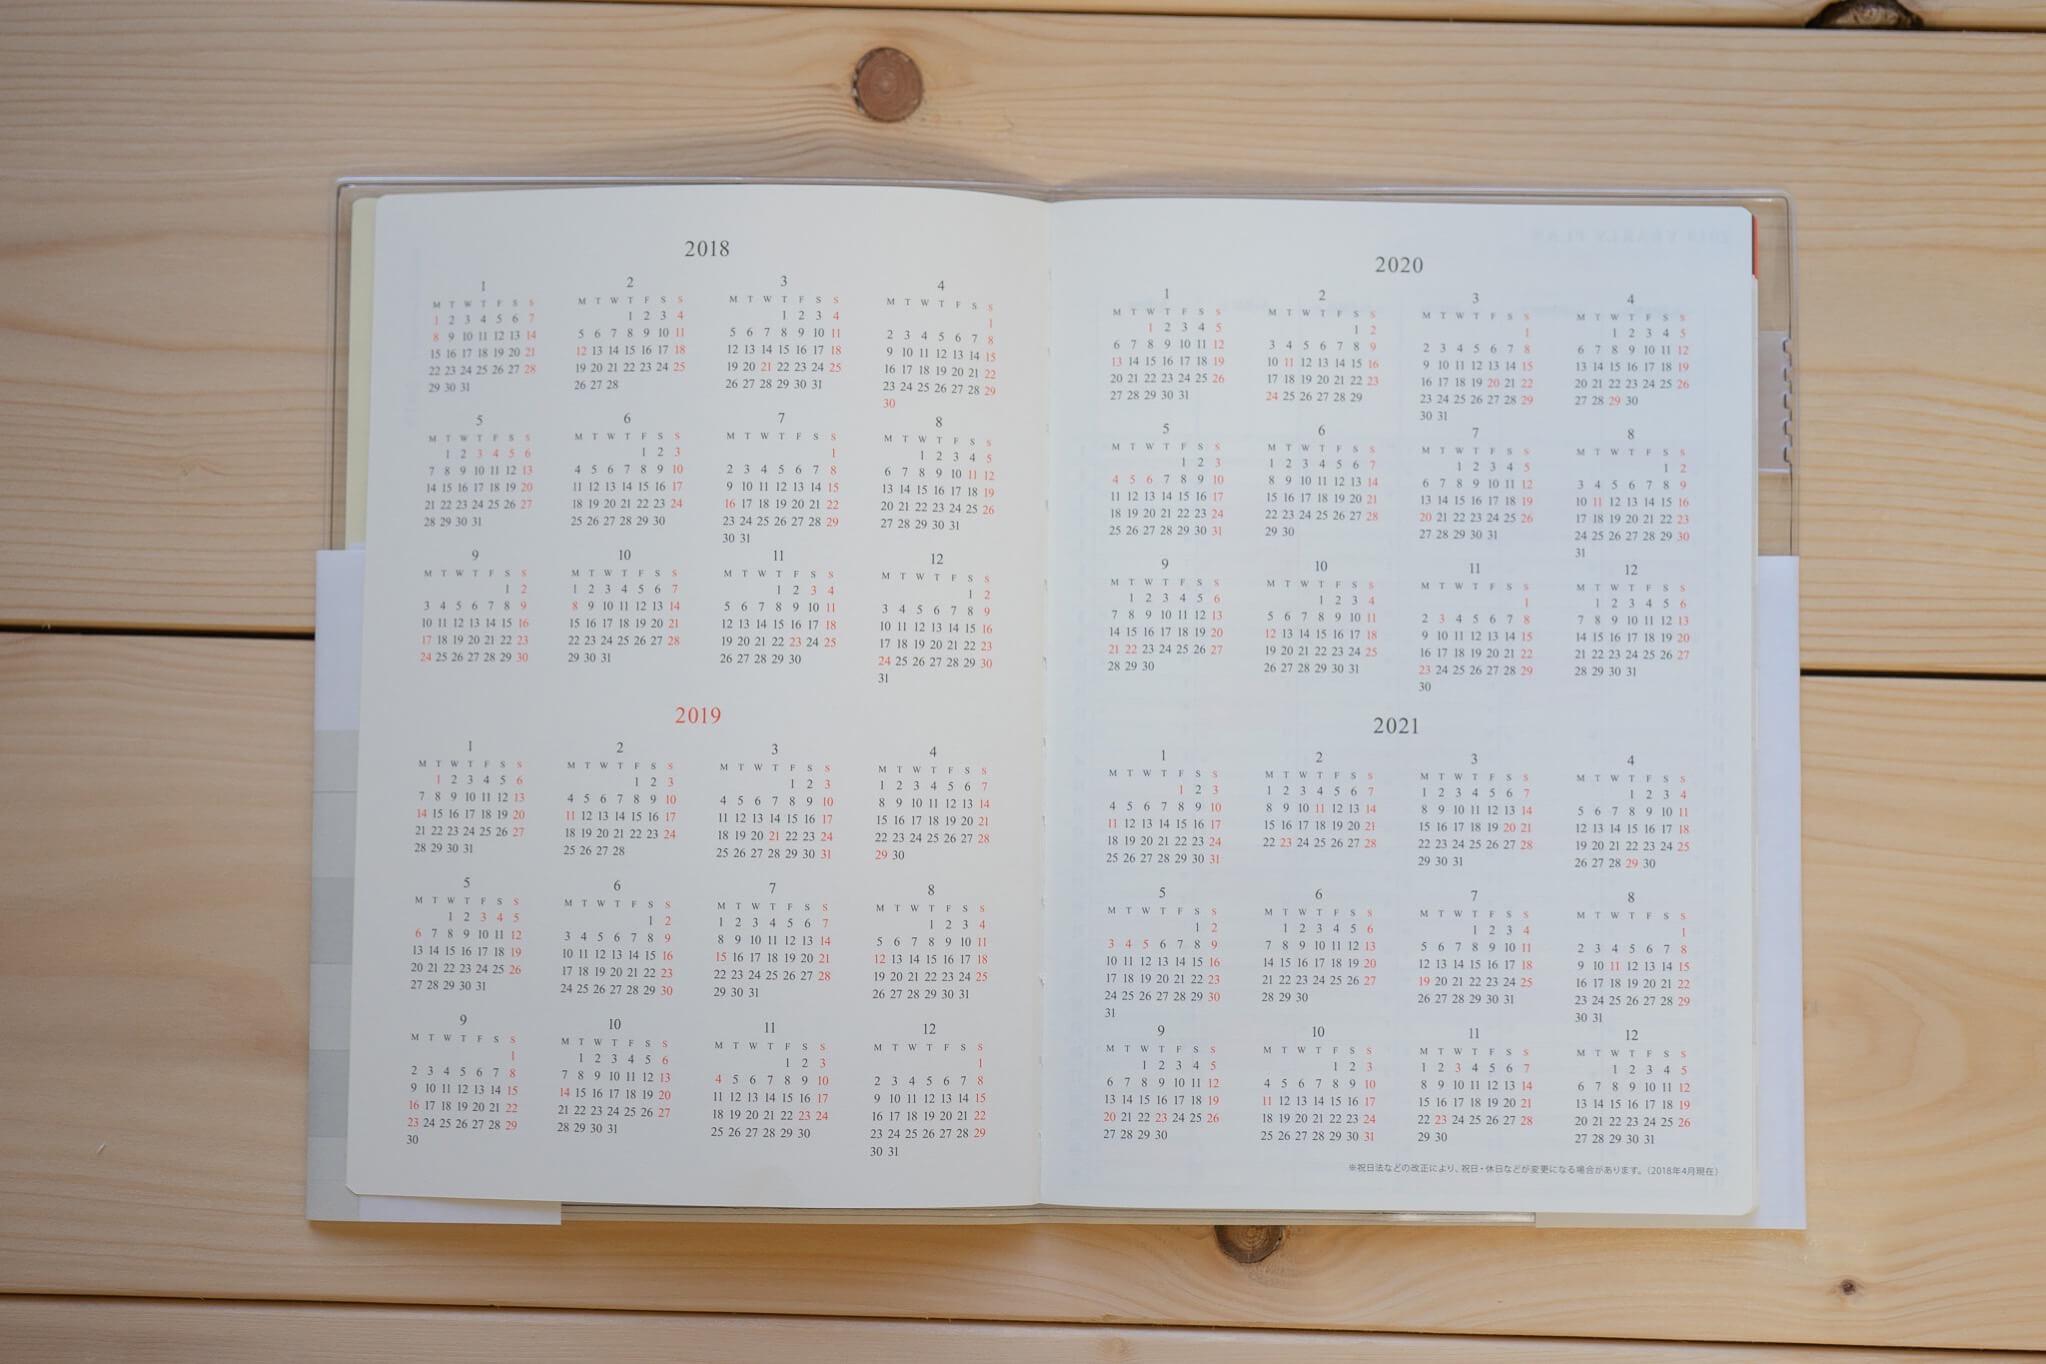 180828 gantt chart diary 4